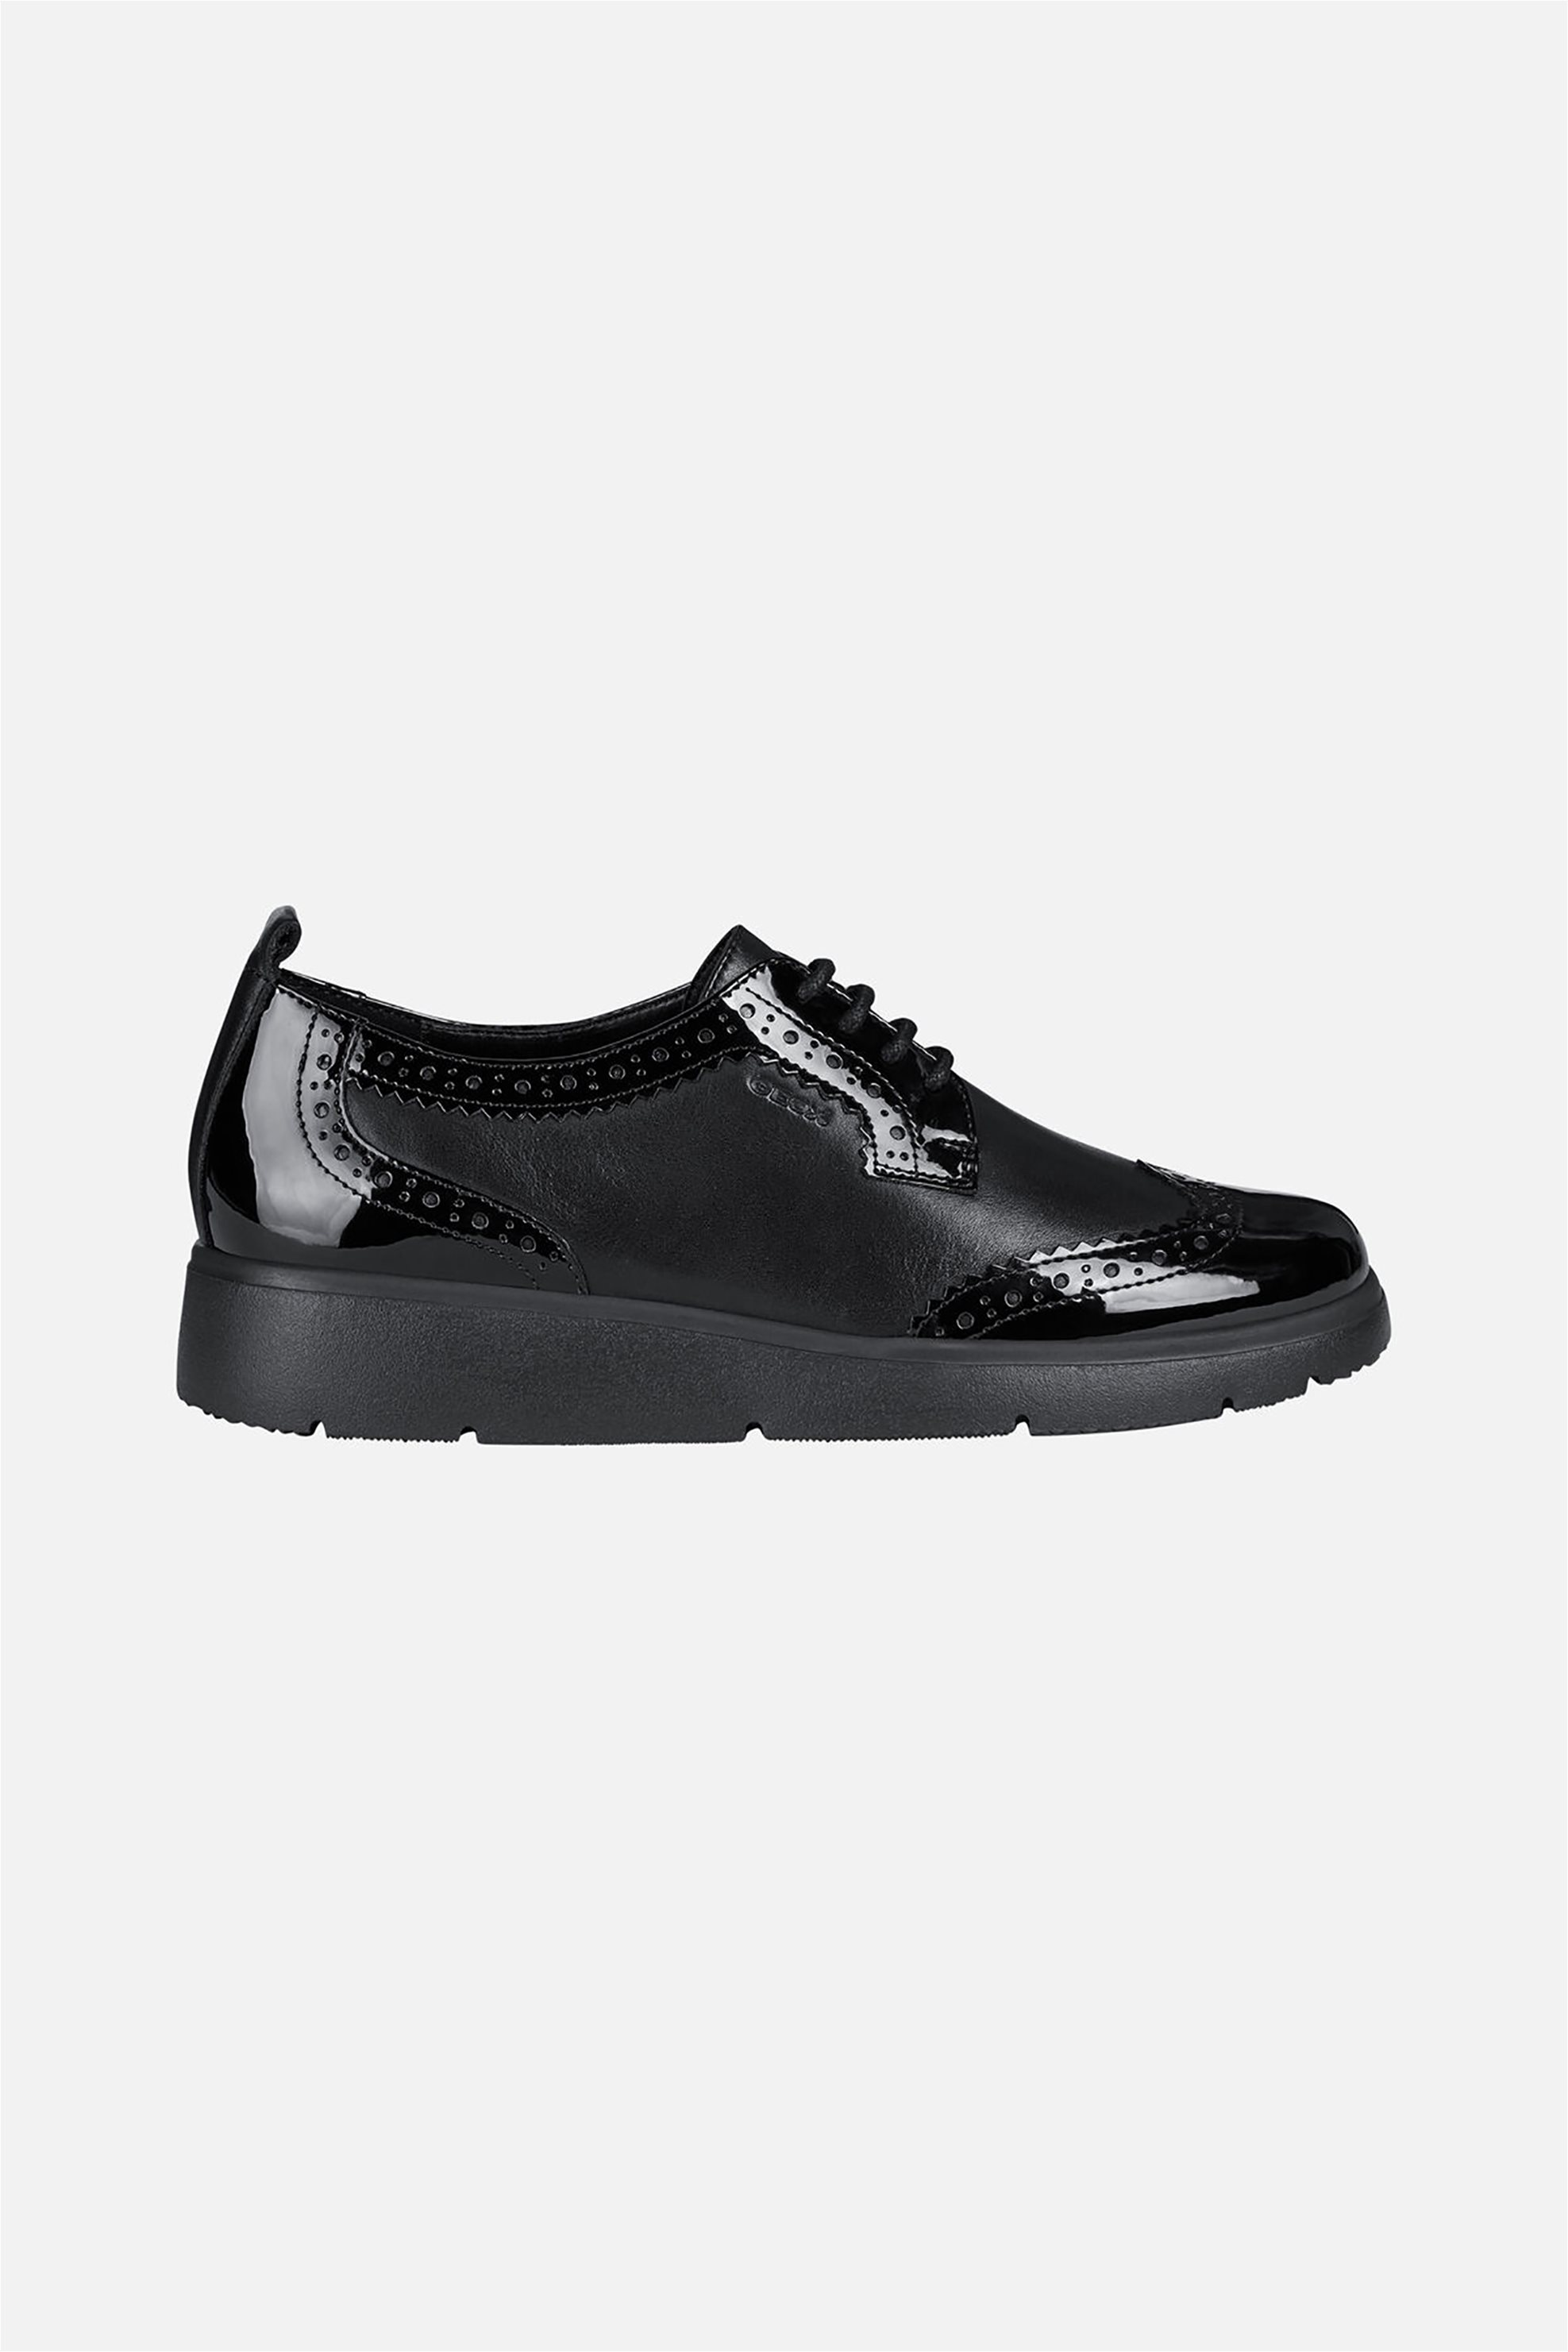 "Geox γυναικεία παπούτσια oxford ""Arlara"" – D04LCI – Μαύρο"